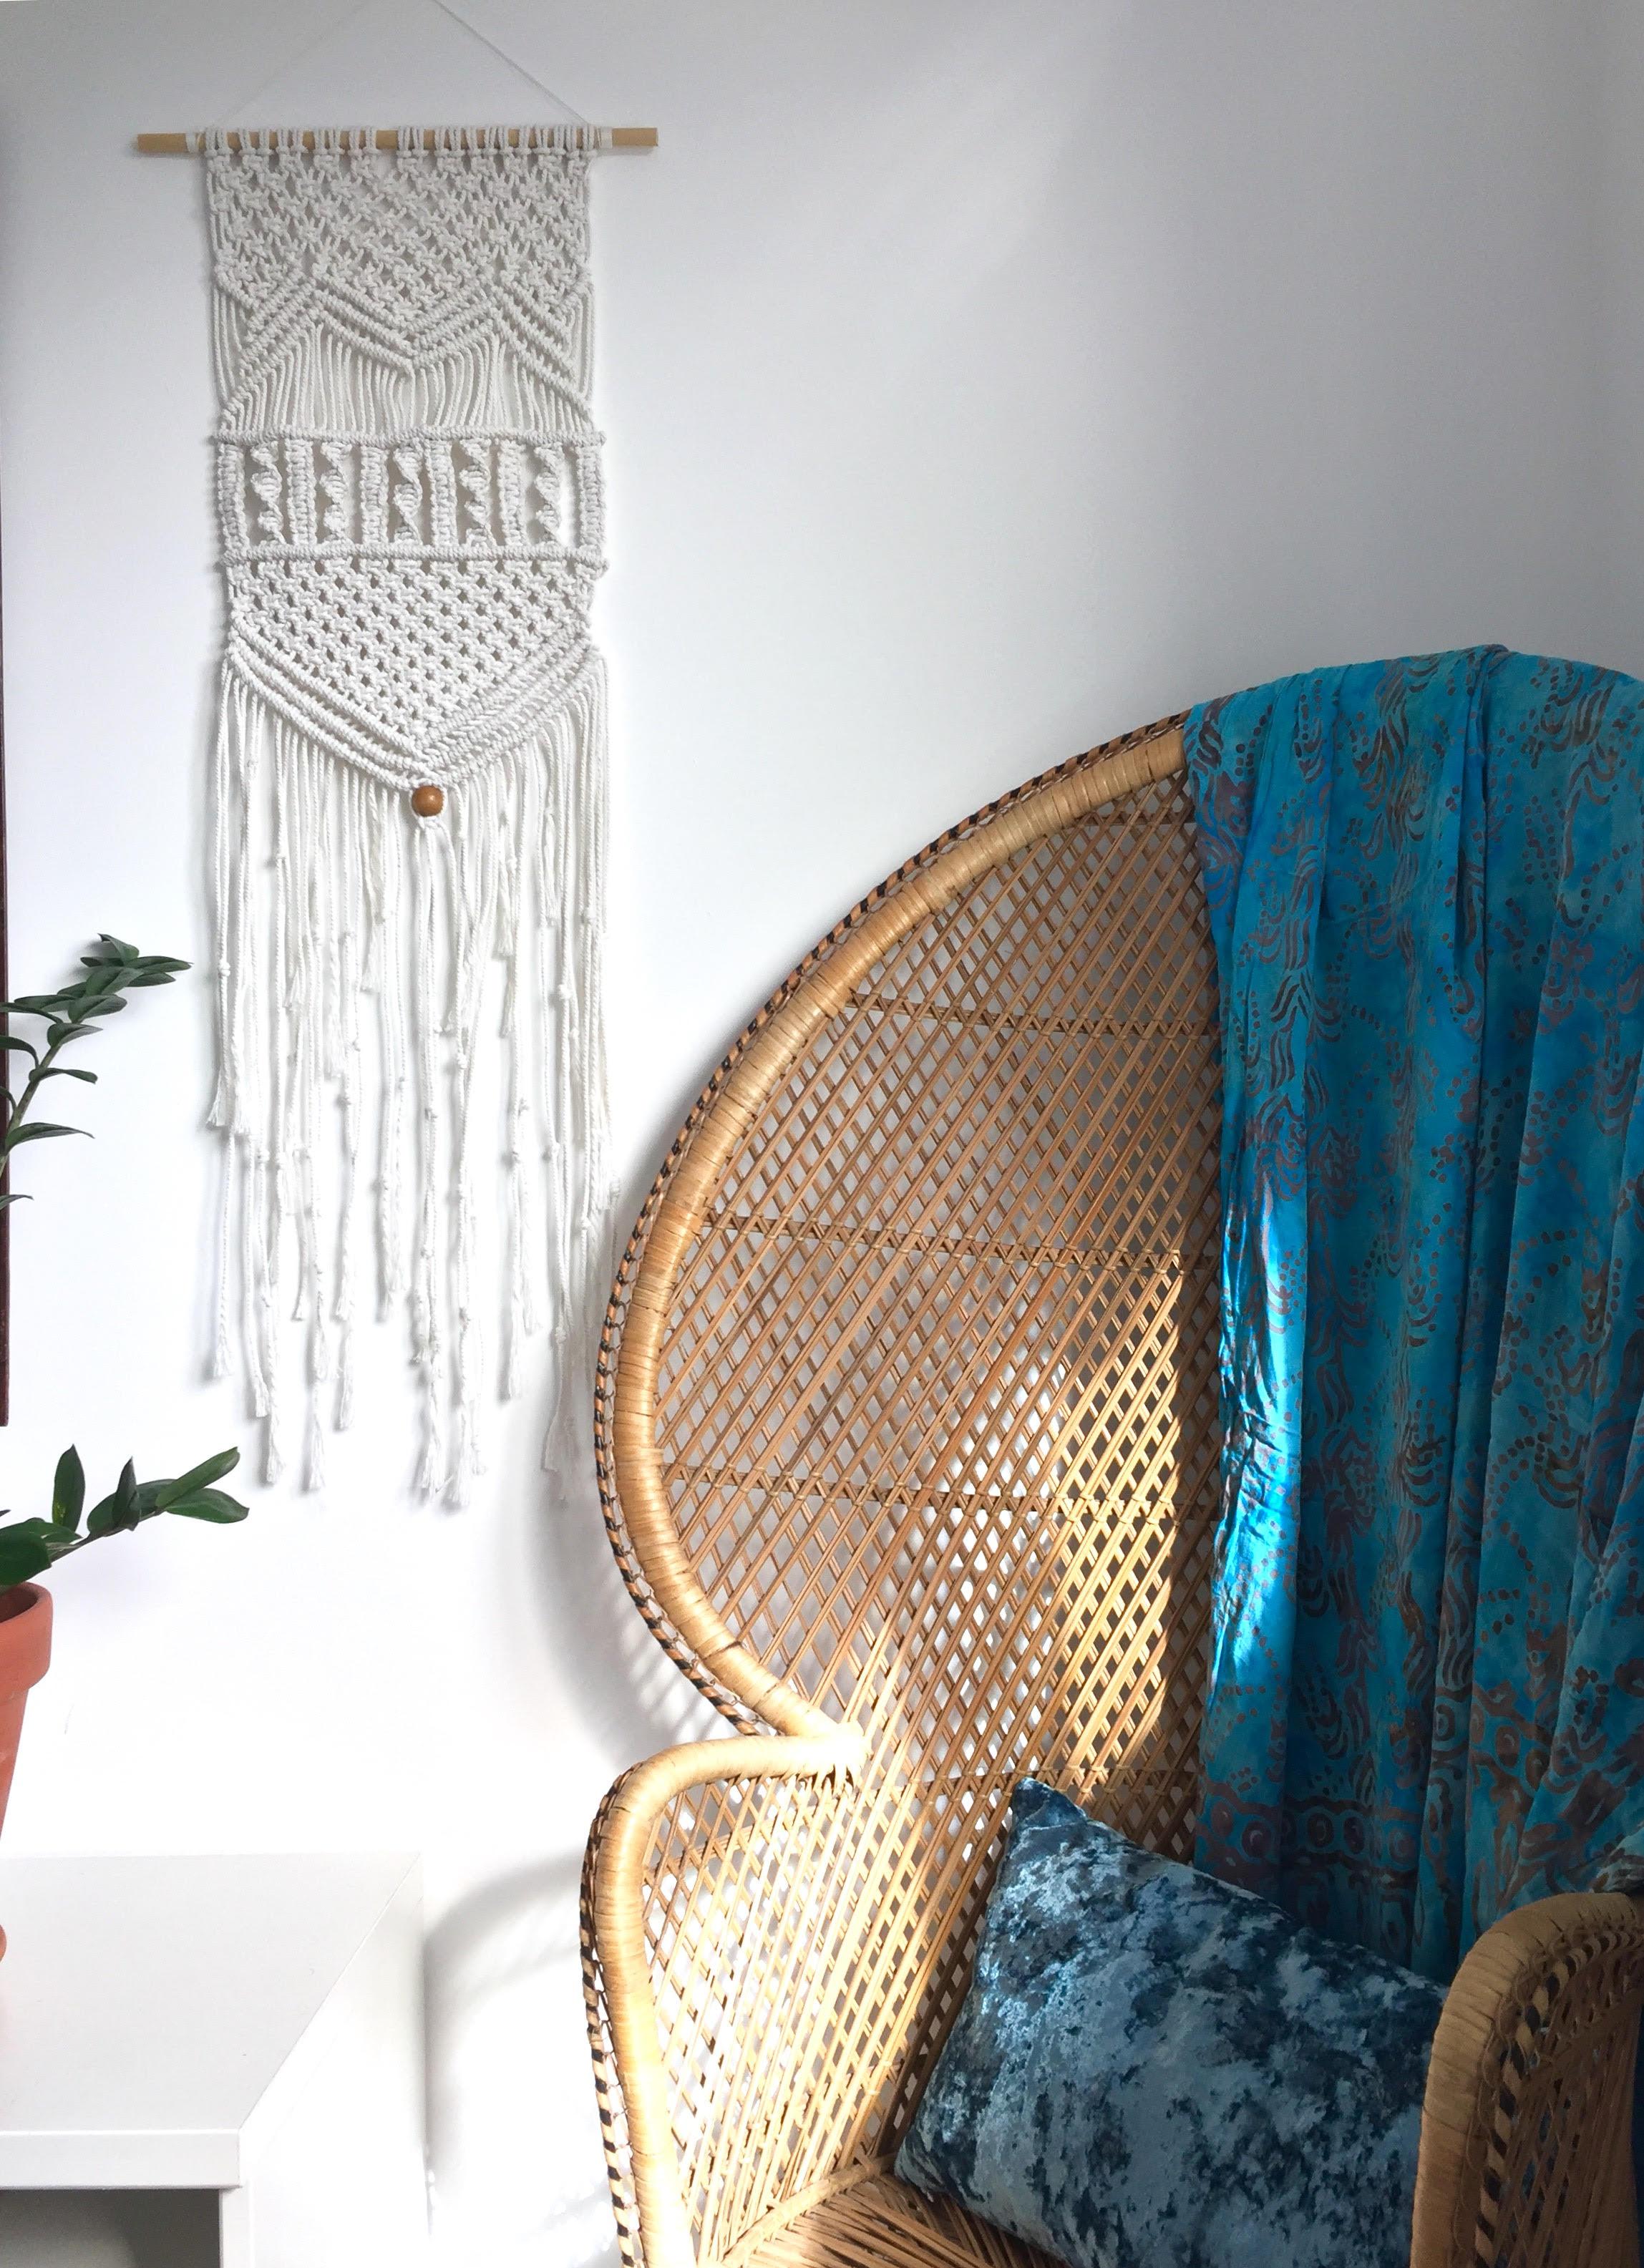 Paper_and_Moon_Louise_Dockery_interior_design_Dublin_Ireland_wall_hanging_macrame_weaving_Weaverella_Emma_Carroll_bohemian_hippy.jpg